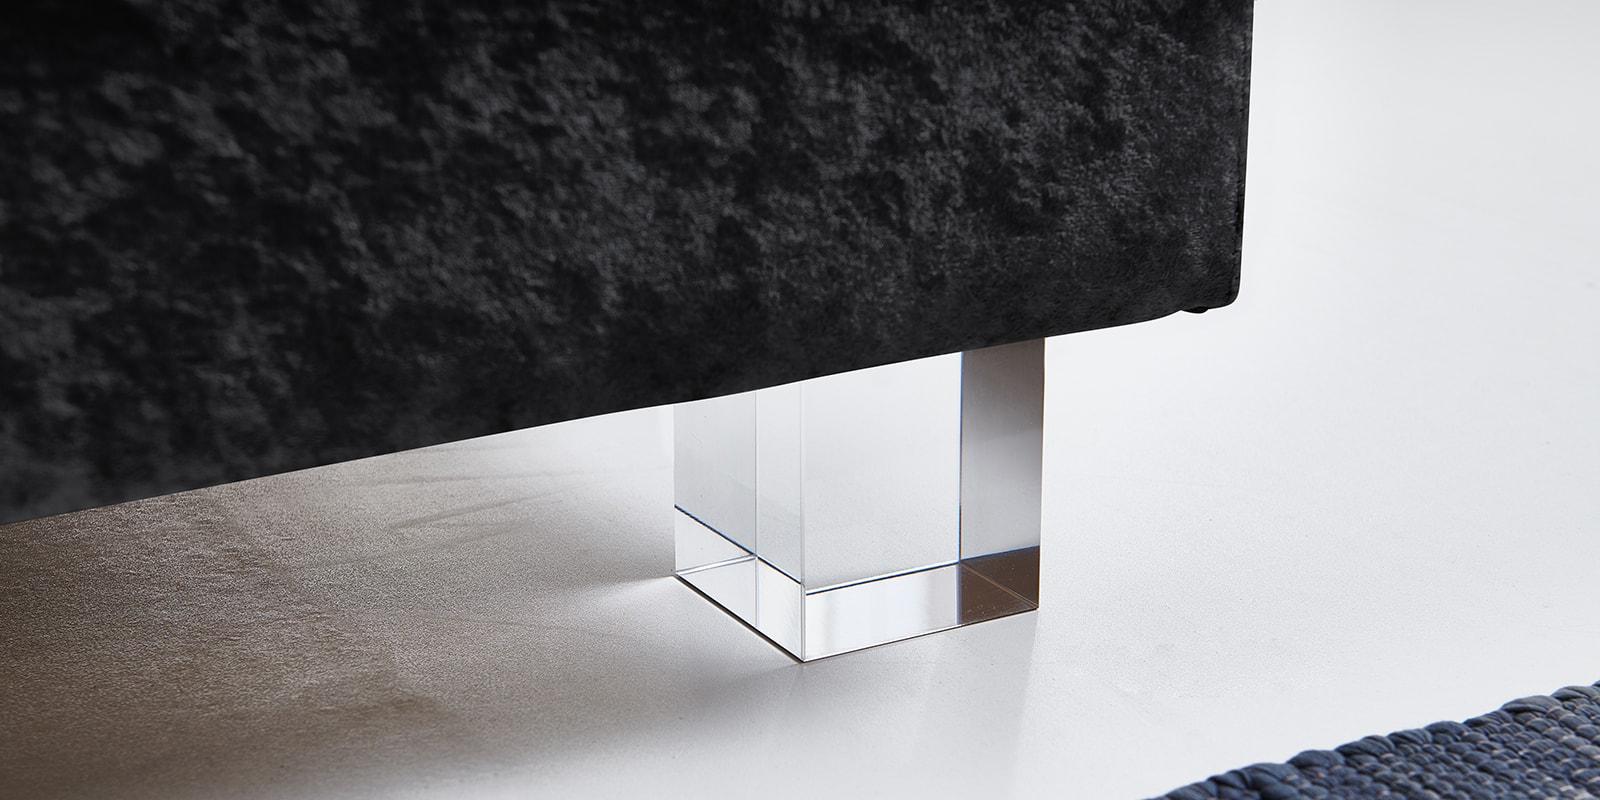 Moebella24 - Boxspringbett - Schwarz - Samt - Acryl Füße eckig - Glas Optik